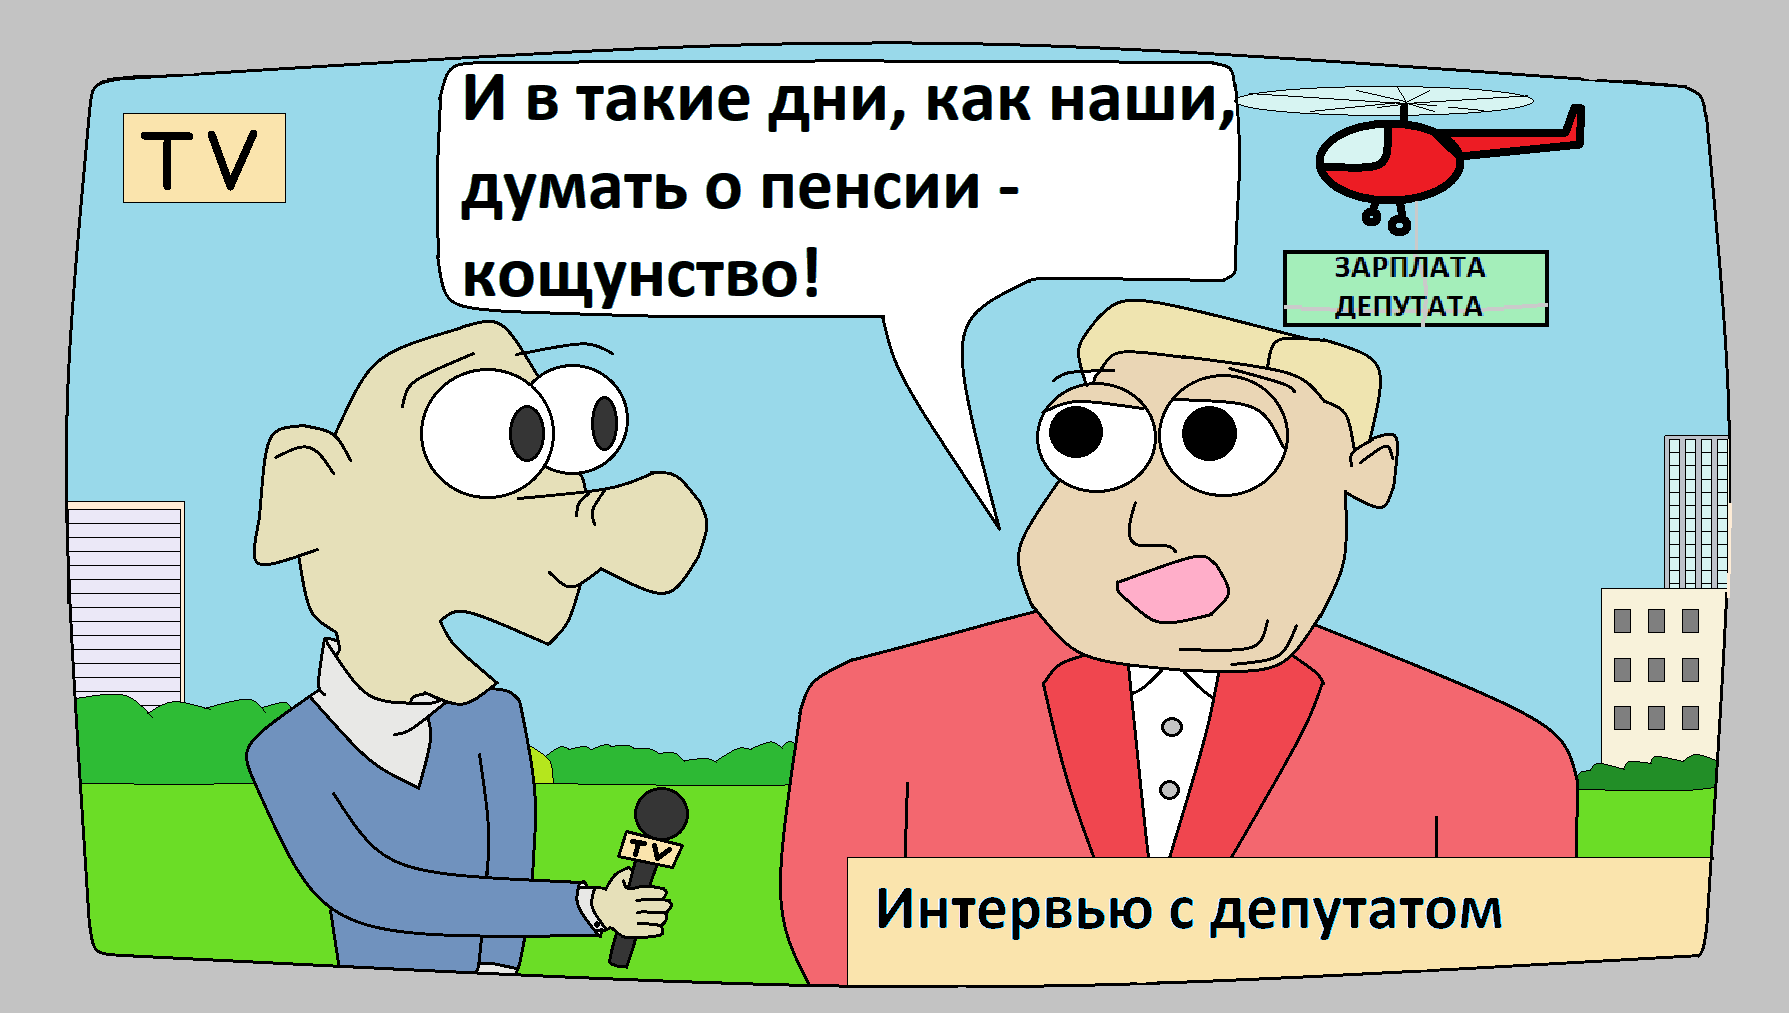 Карикатура: Кощунство